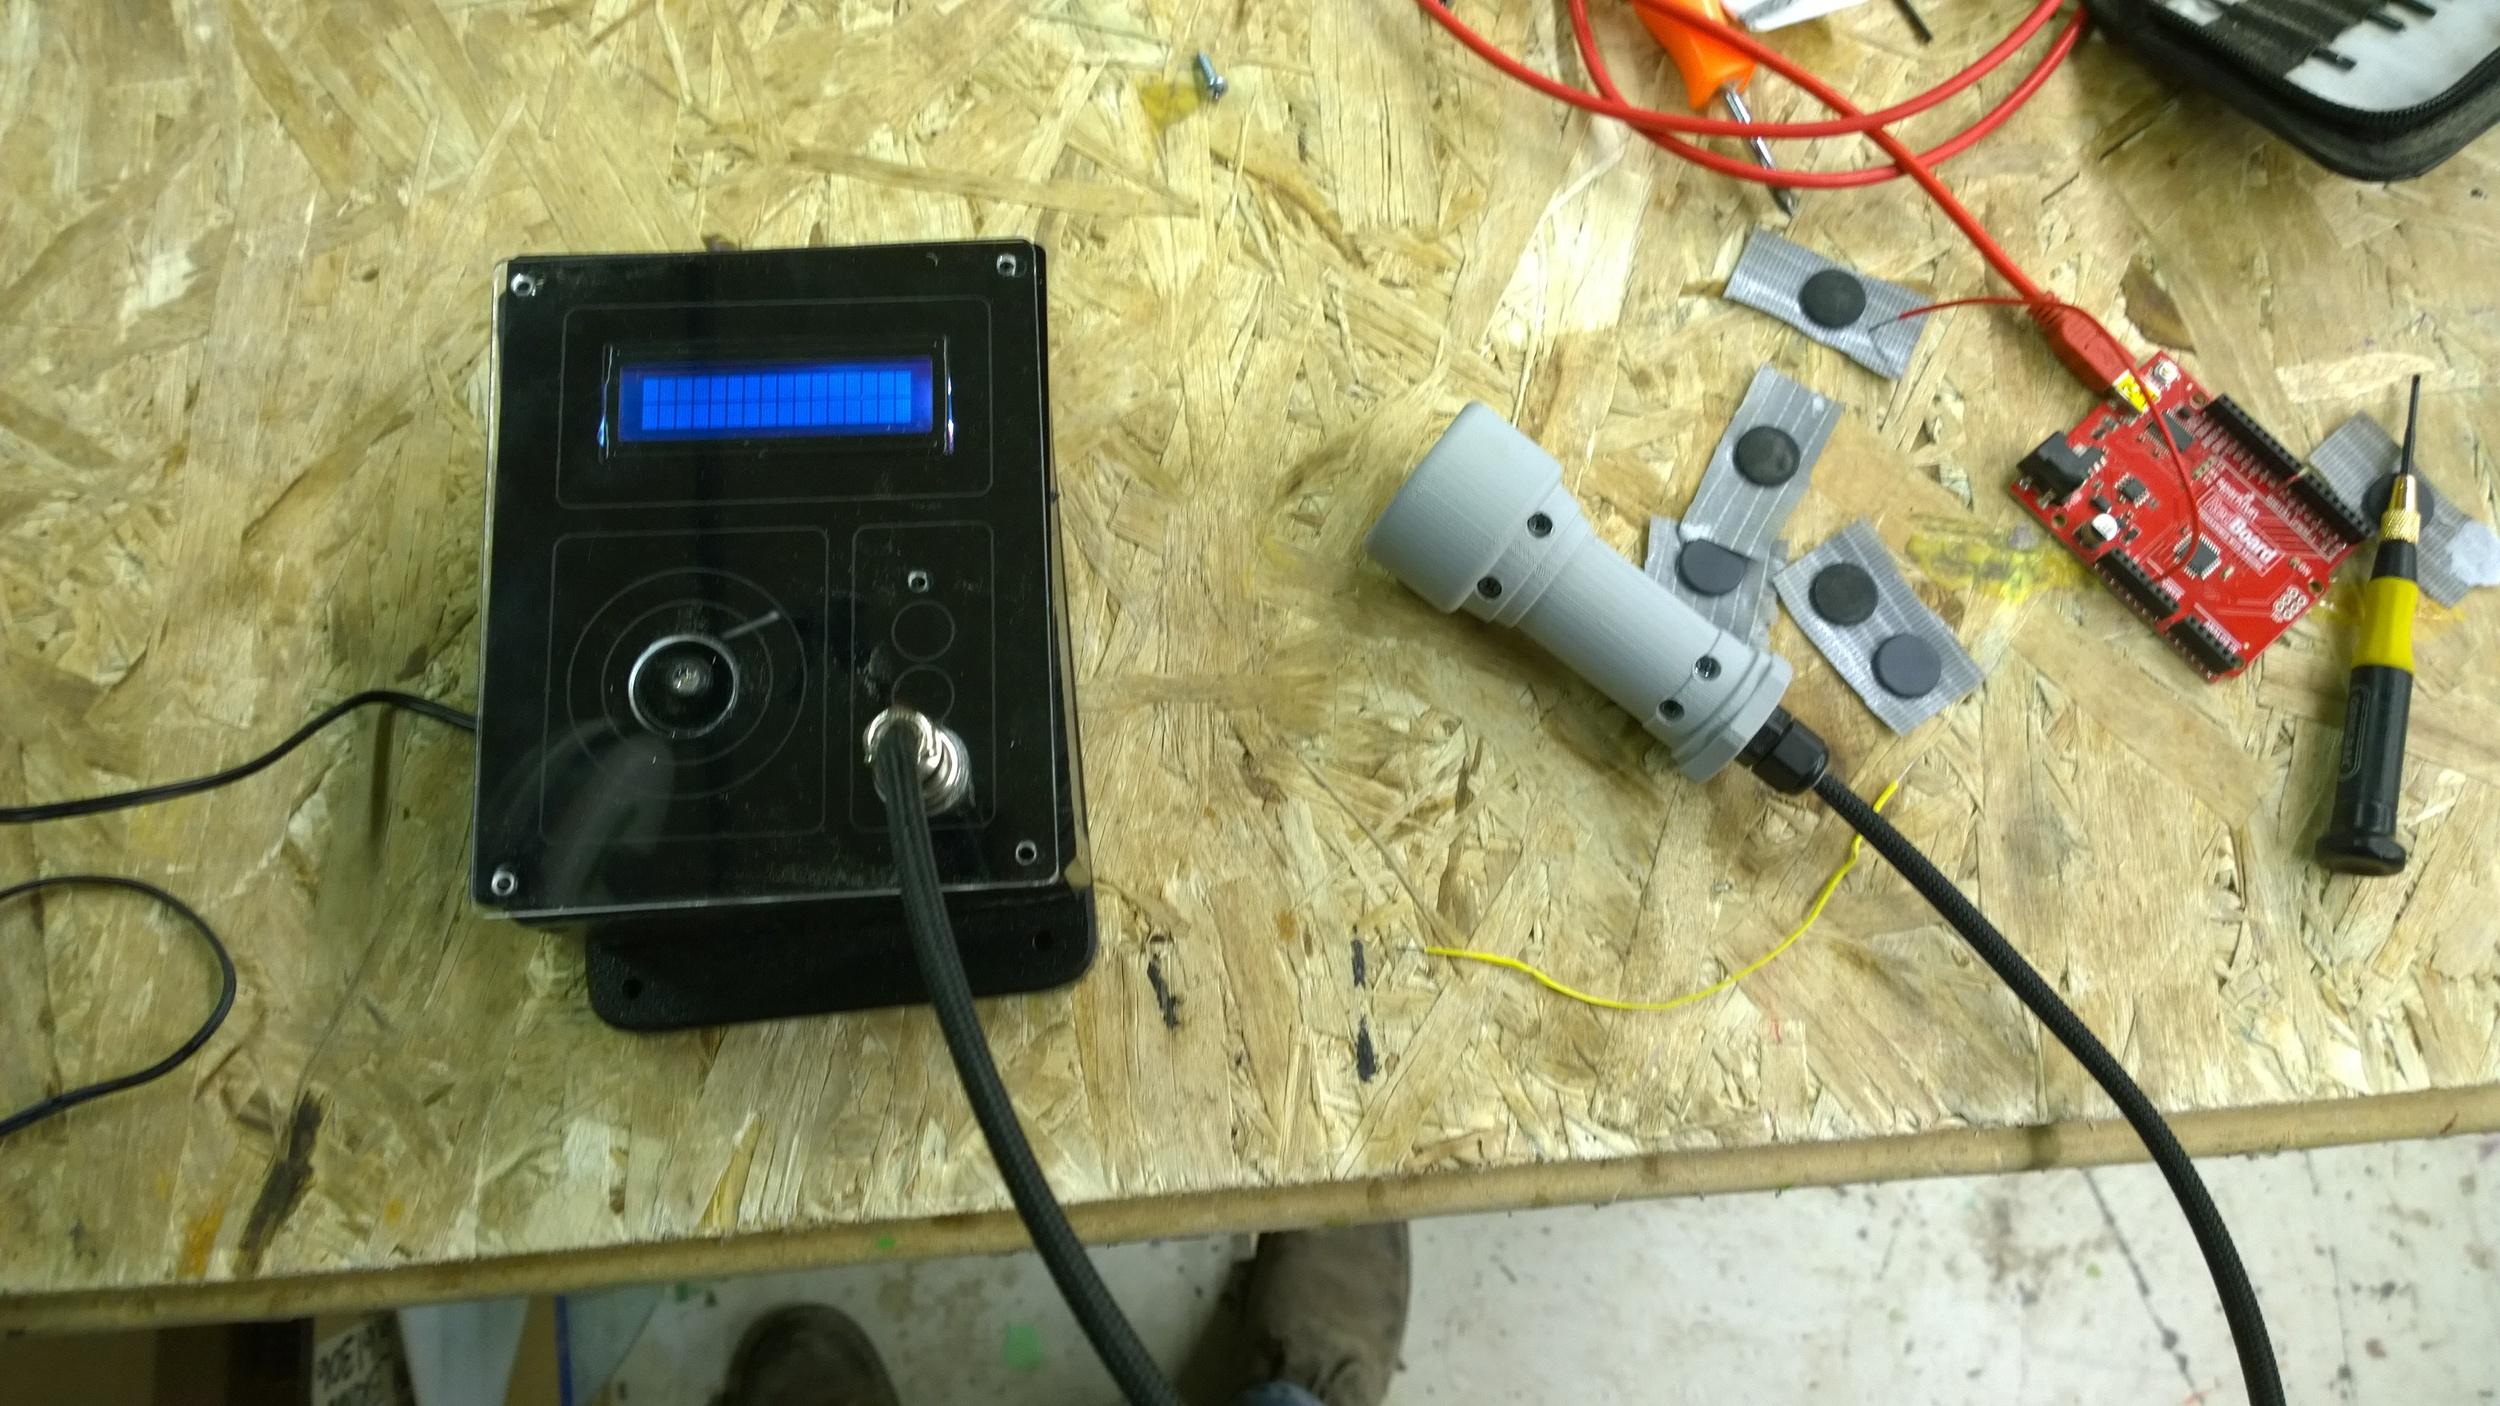 Diagnostic RFID reader